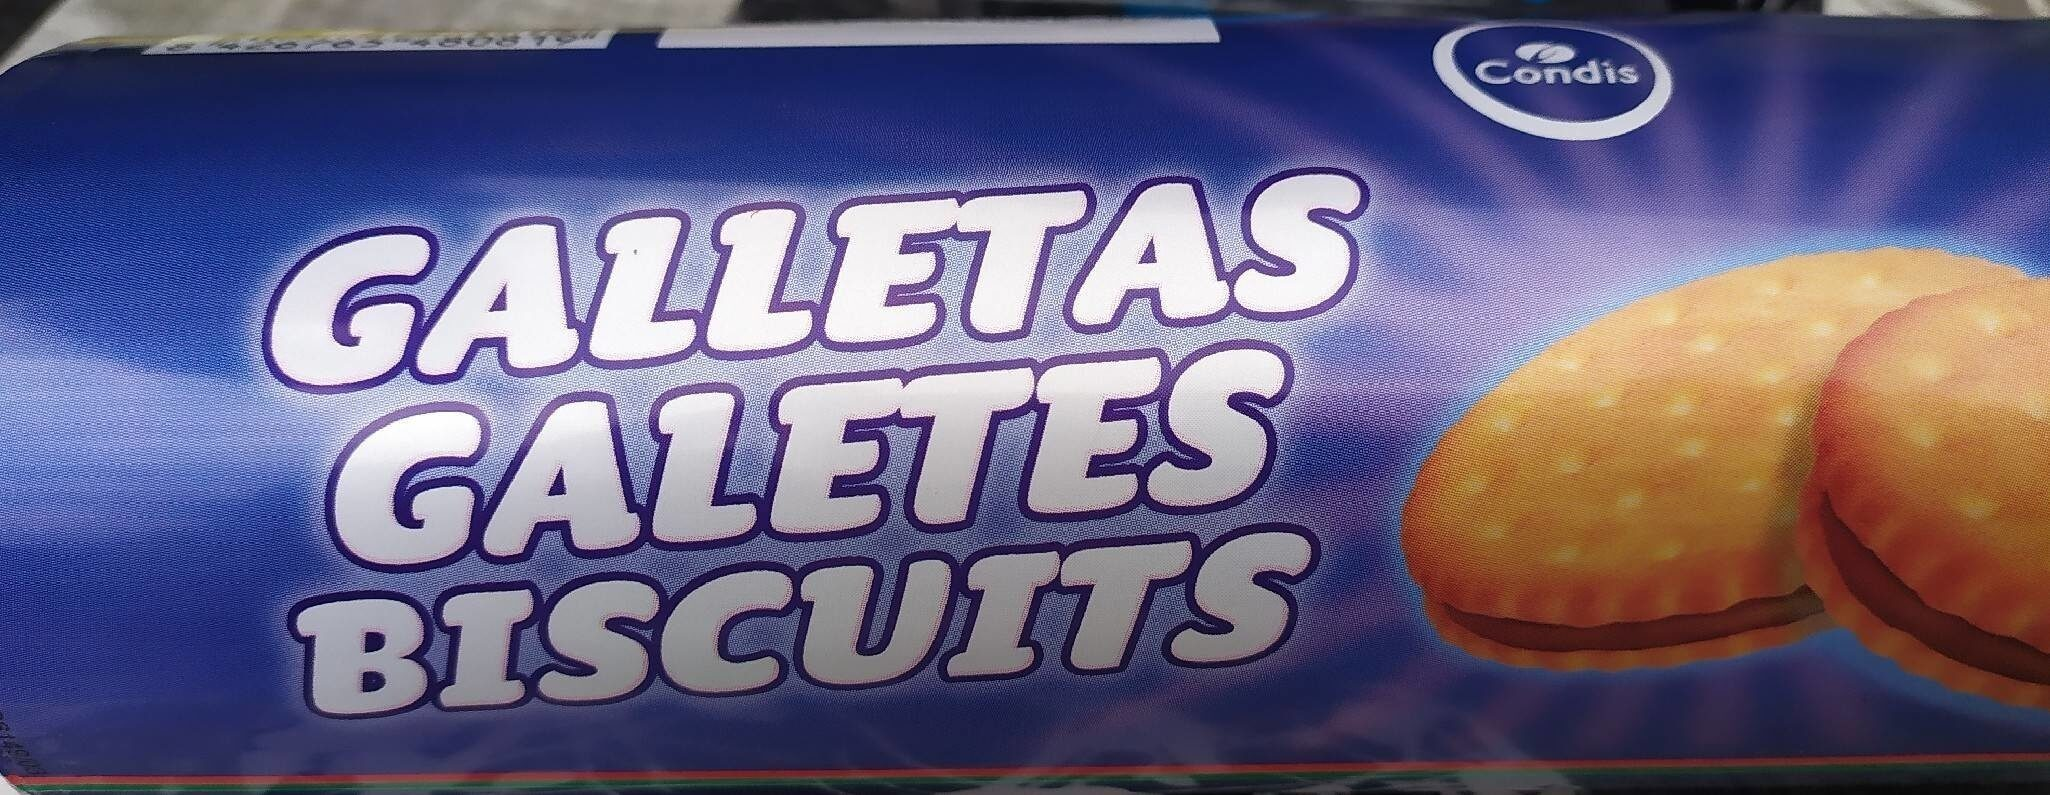 Galetes Condis A / Xocolata - Product - es